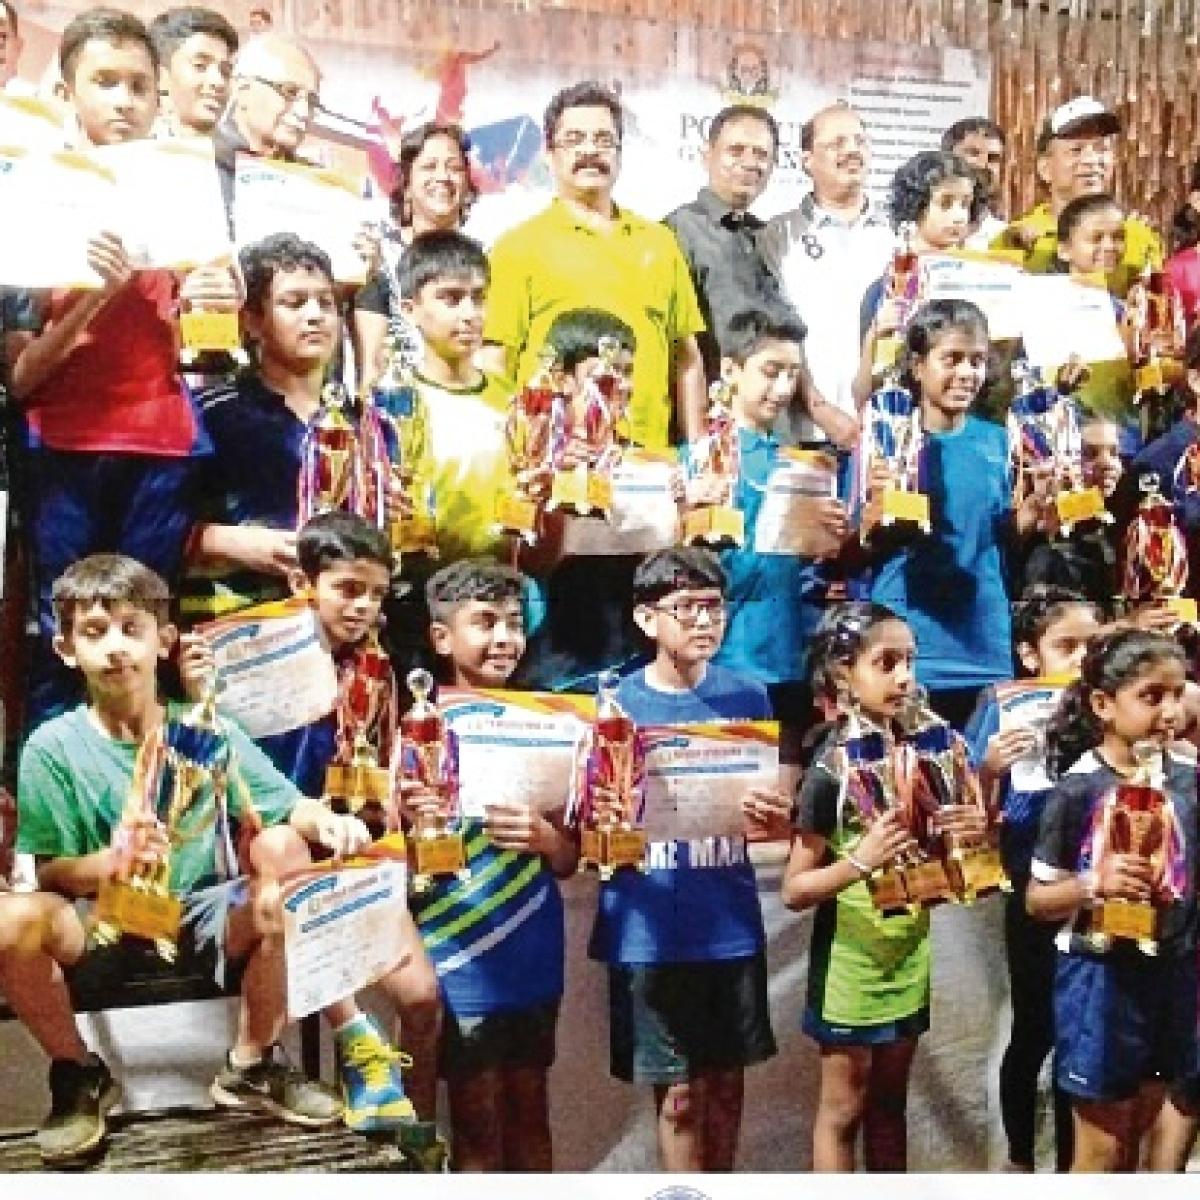 MSDTTA Pro-table tennis tournament: Double delight for Manasi Jare